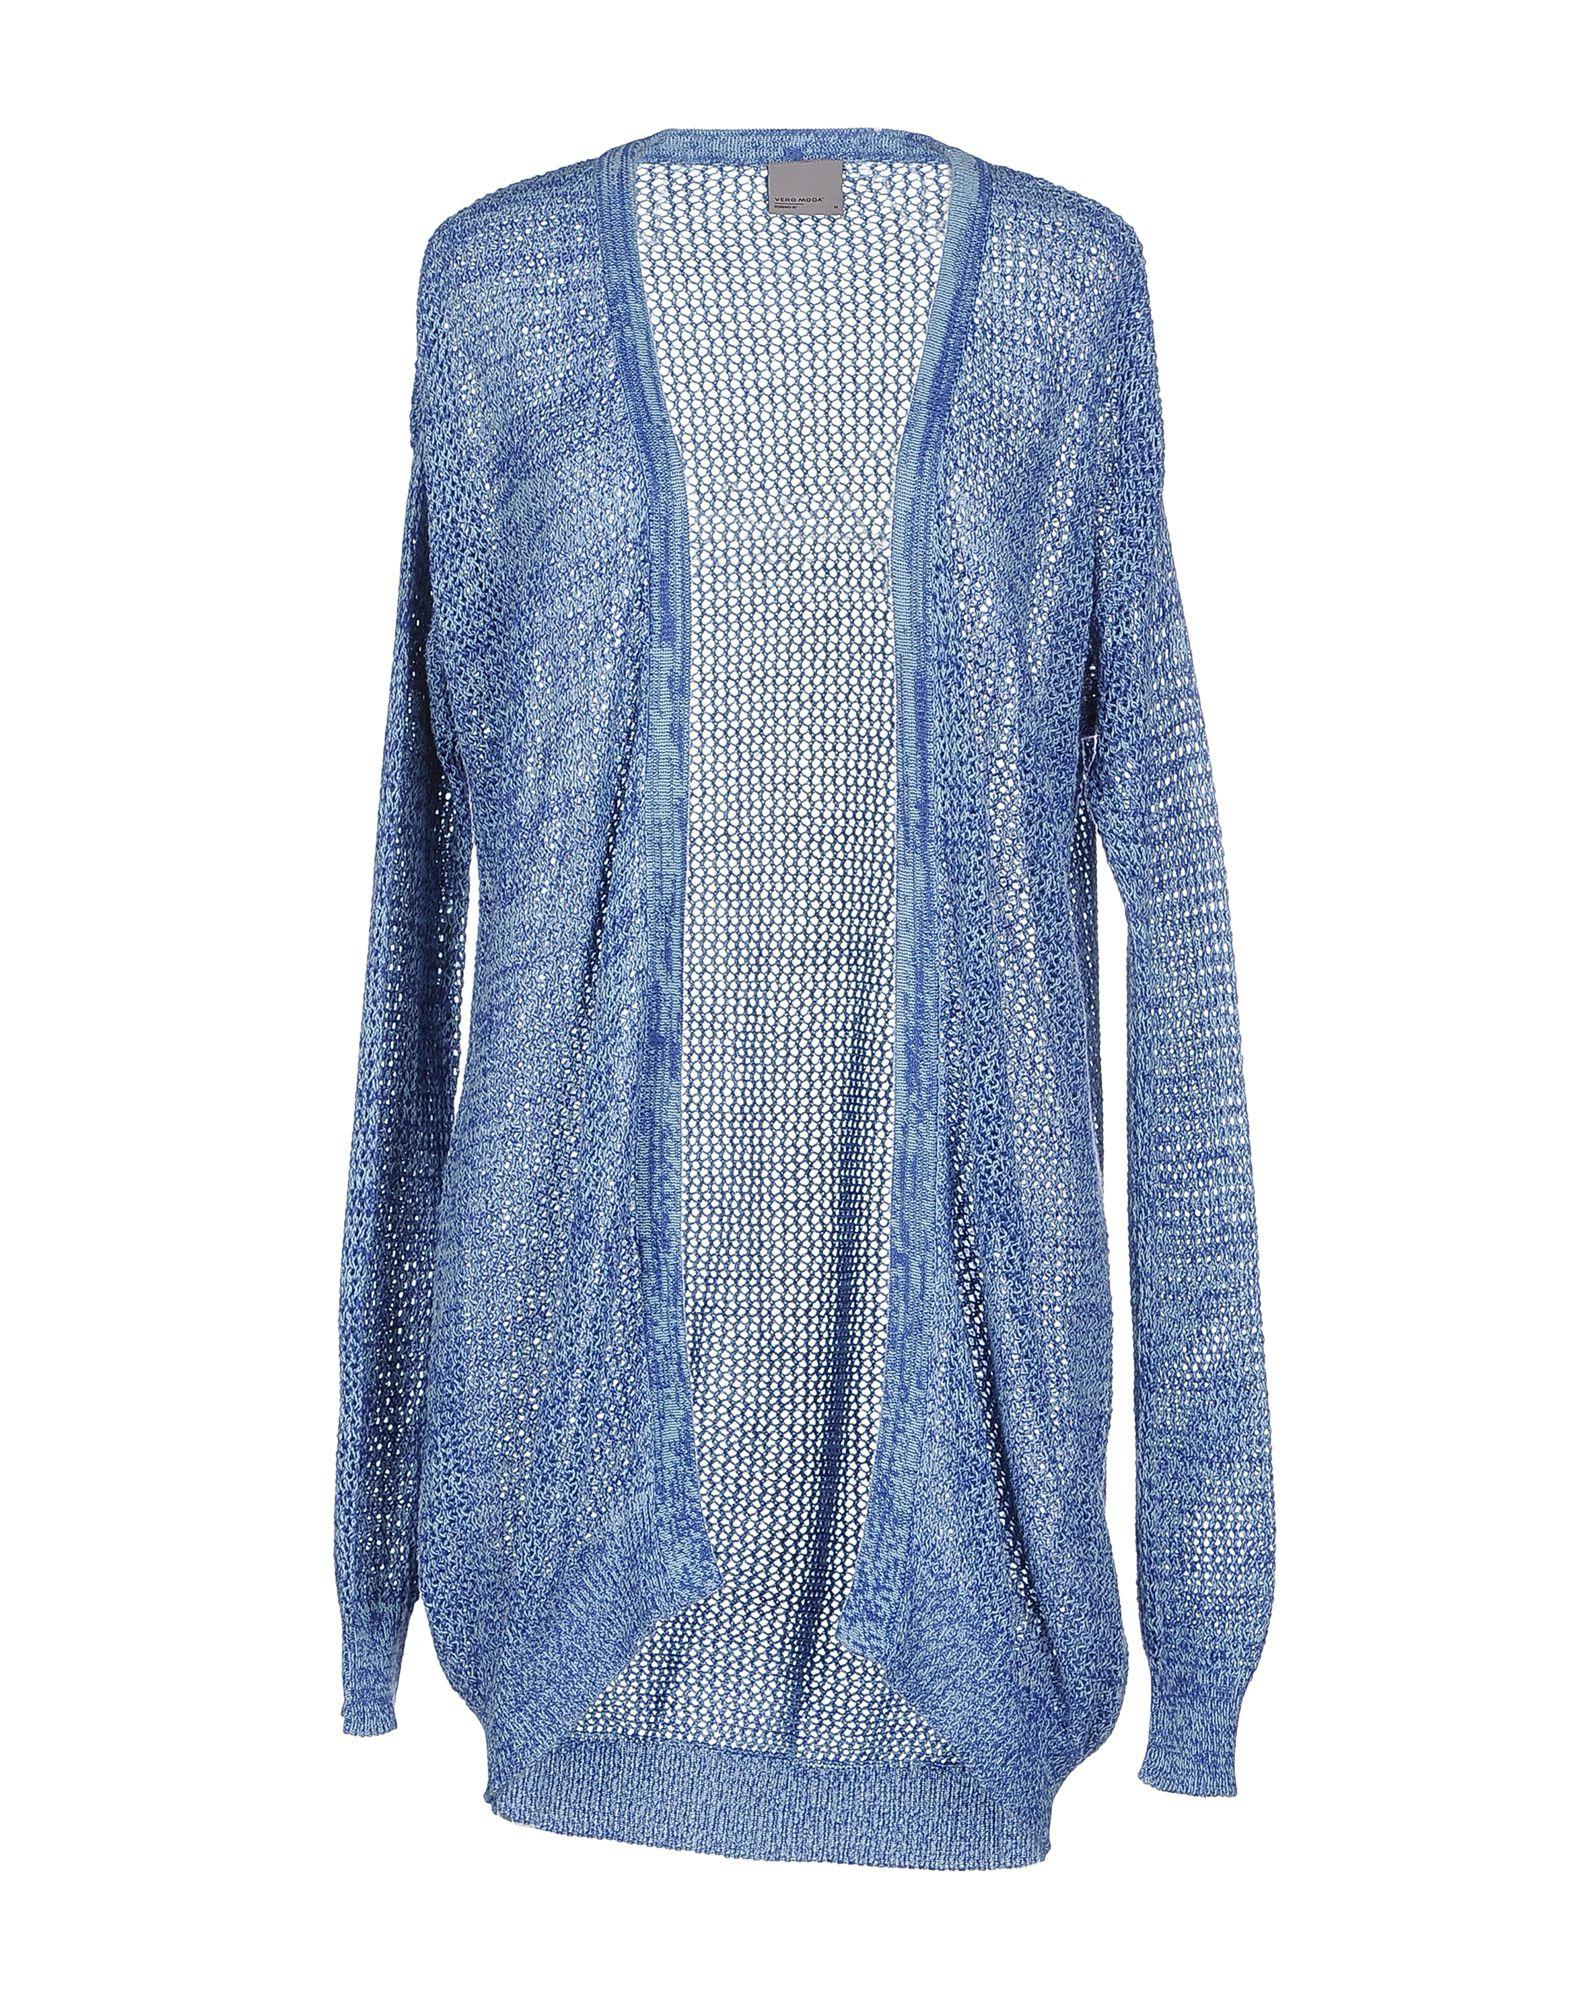 Vero Moda Knitting Patterns : Lyst vero moda cardigan in blue